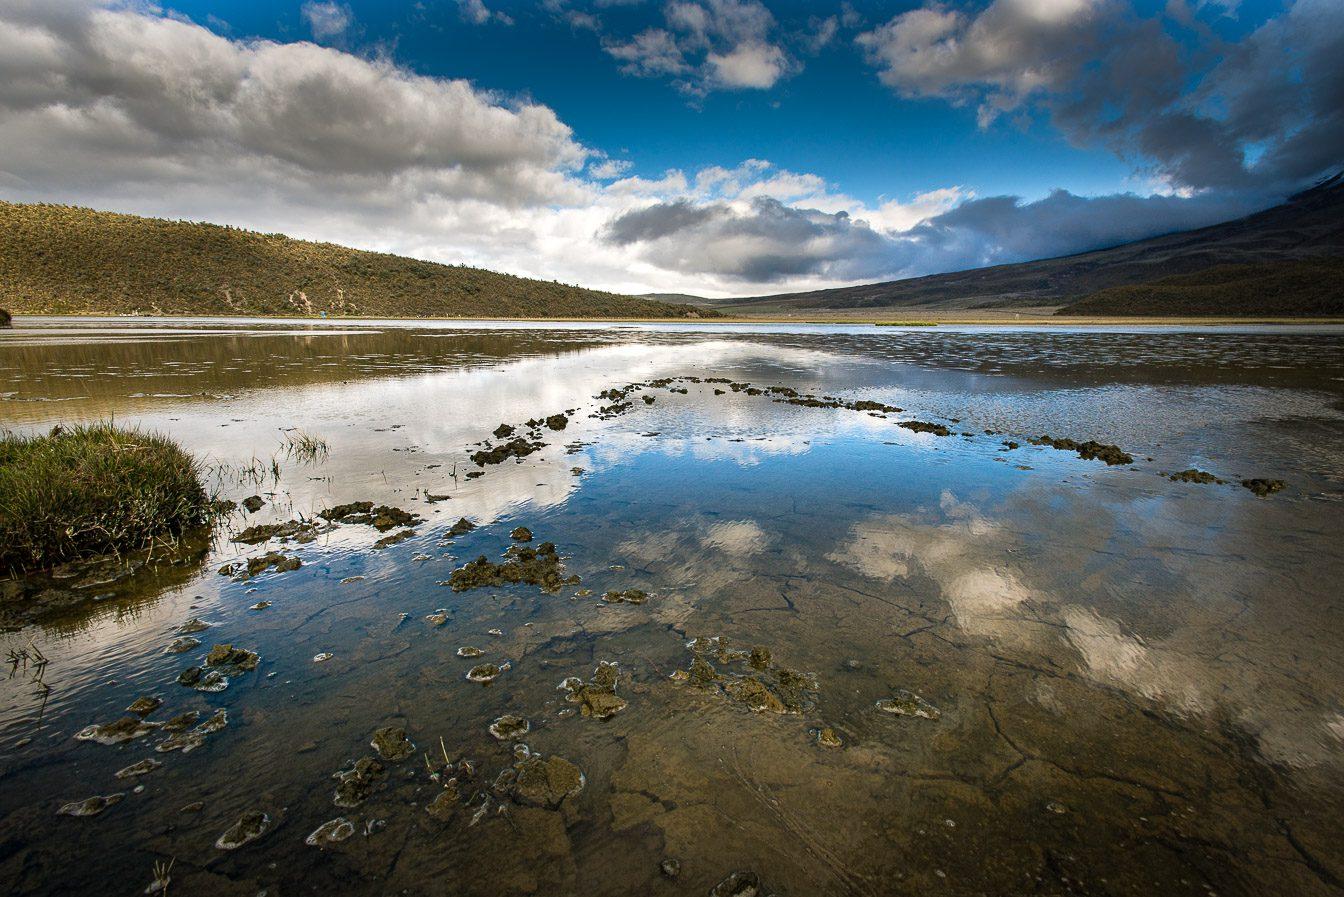 Limpiopungo lagoon Cotopaxi national park